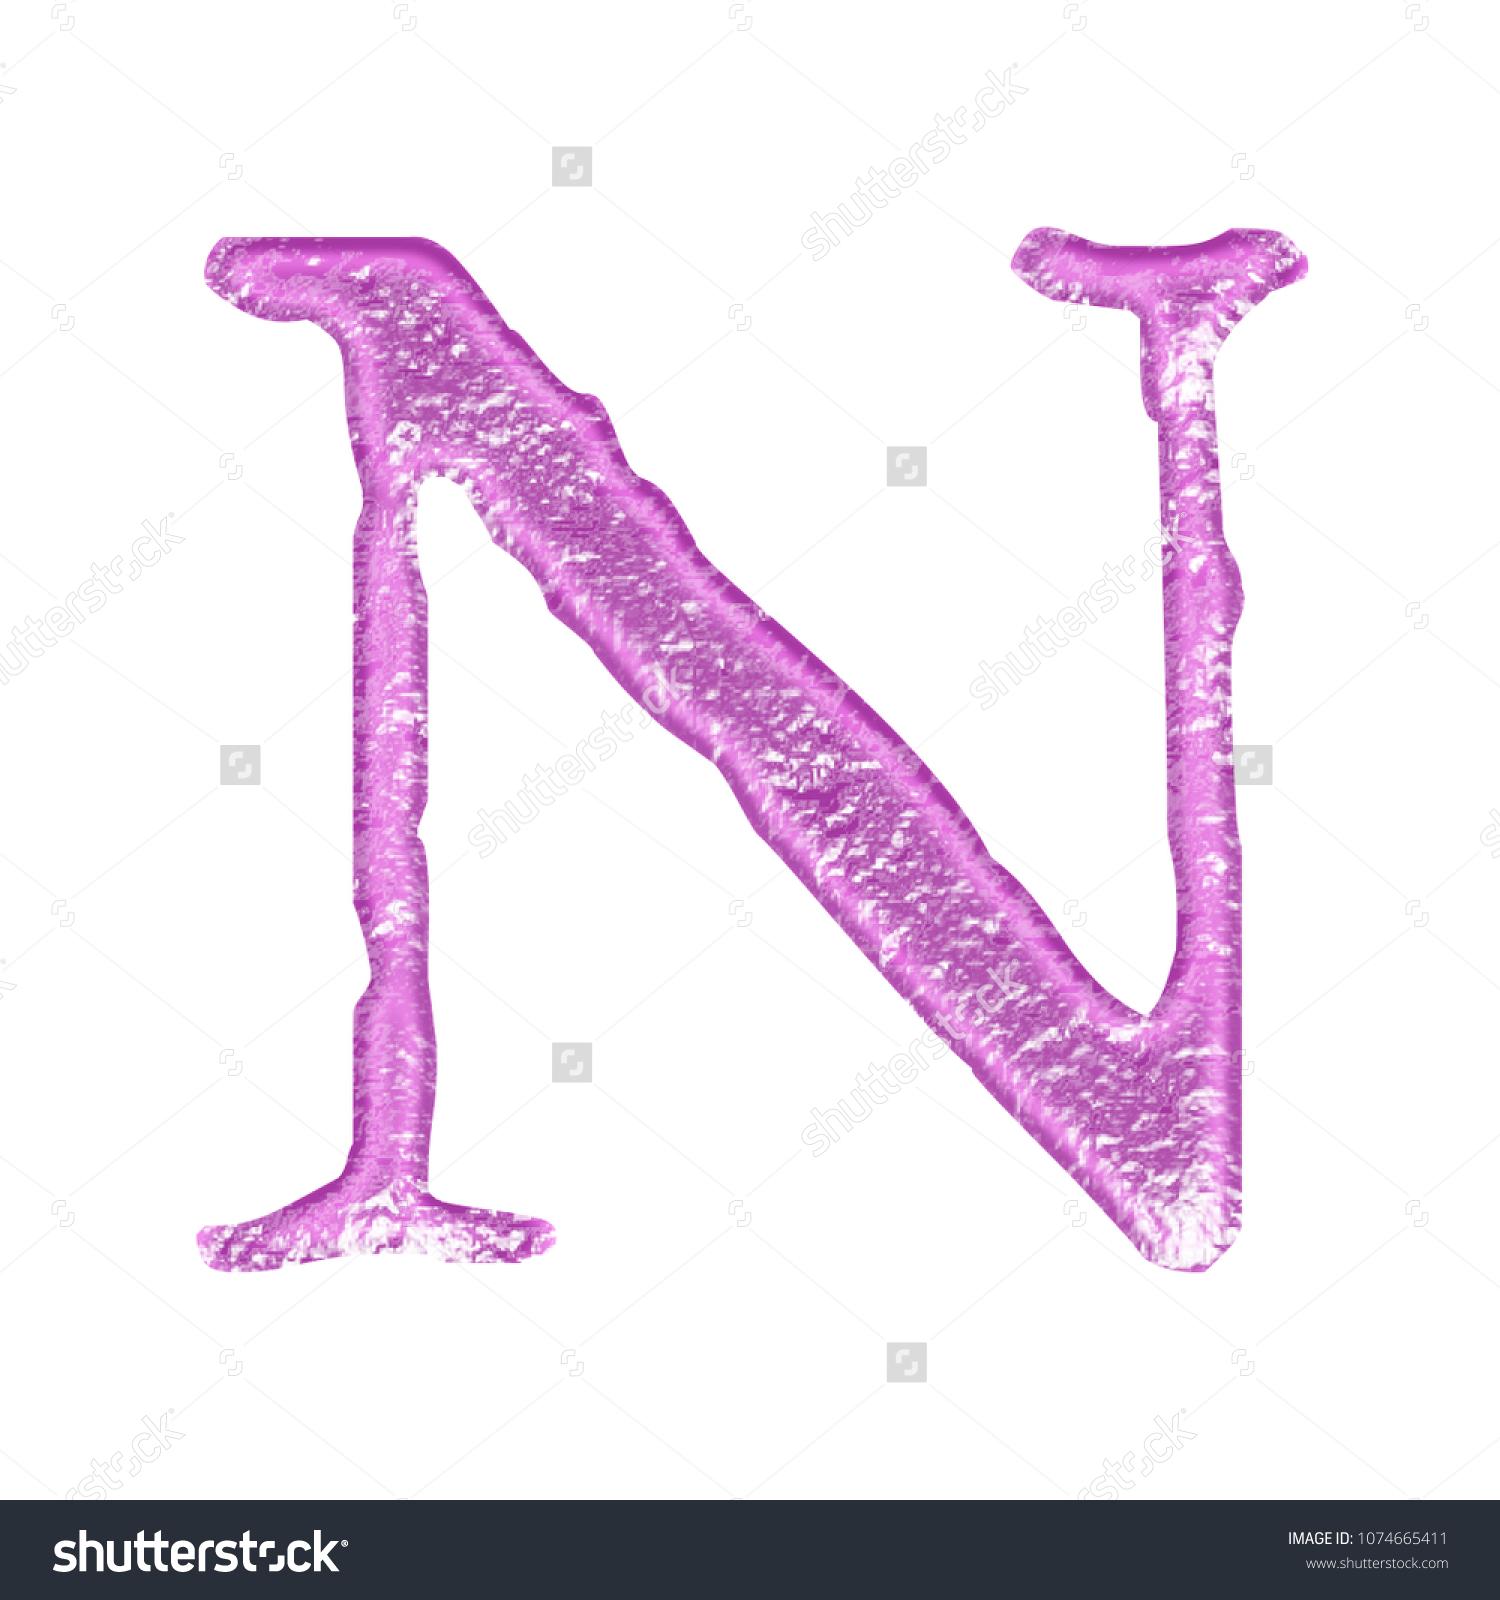 Rough Bright Pink Color Metal Letter Stock Illustration 1074665411 ...